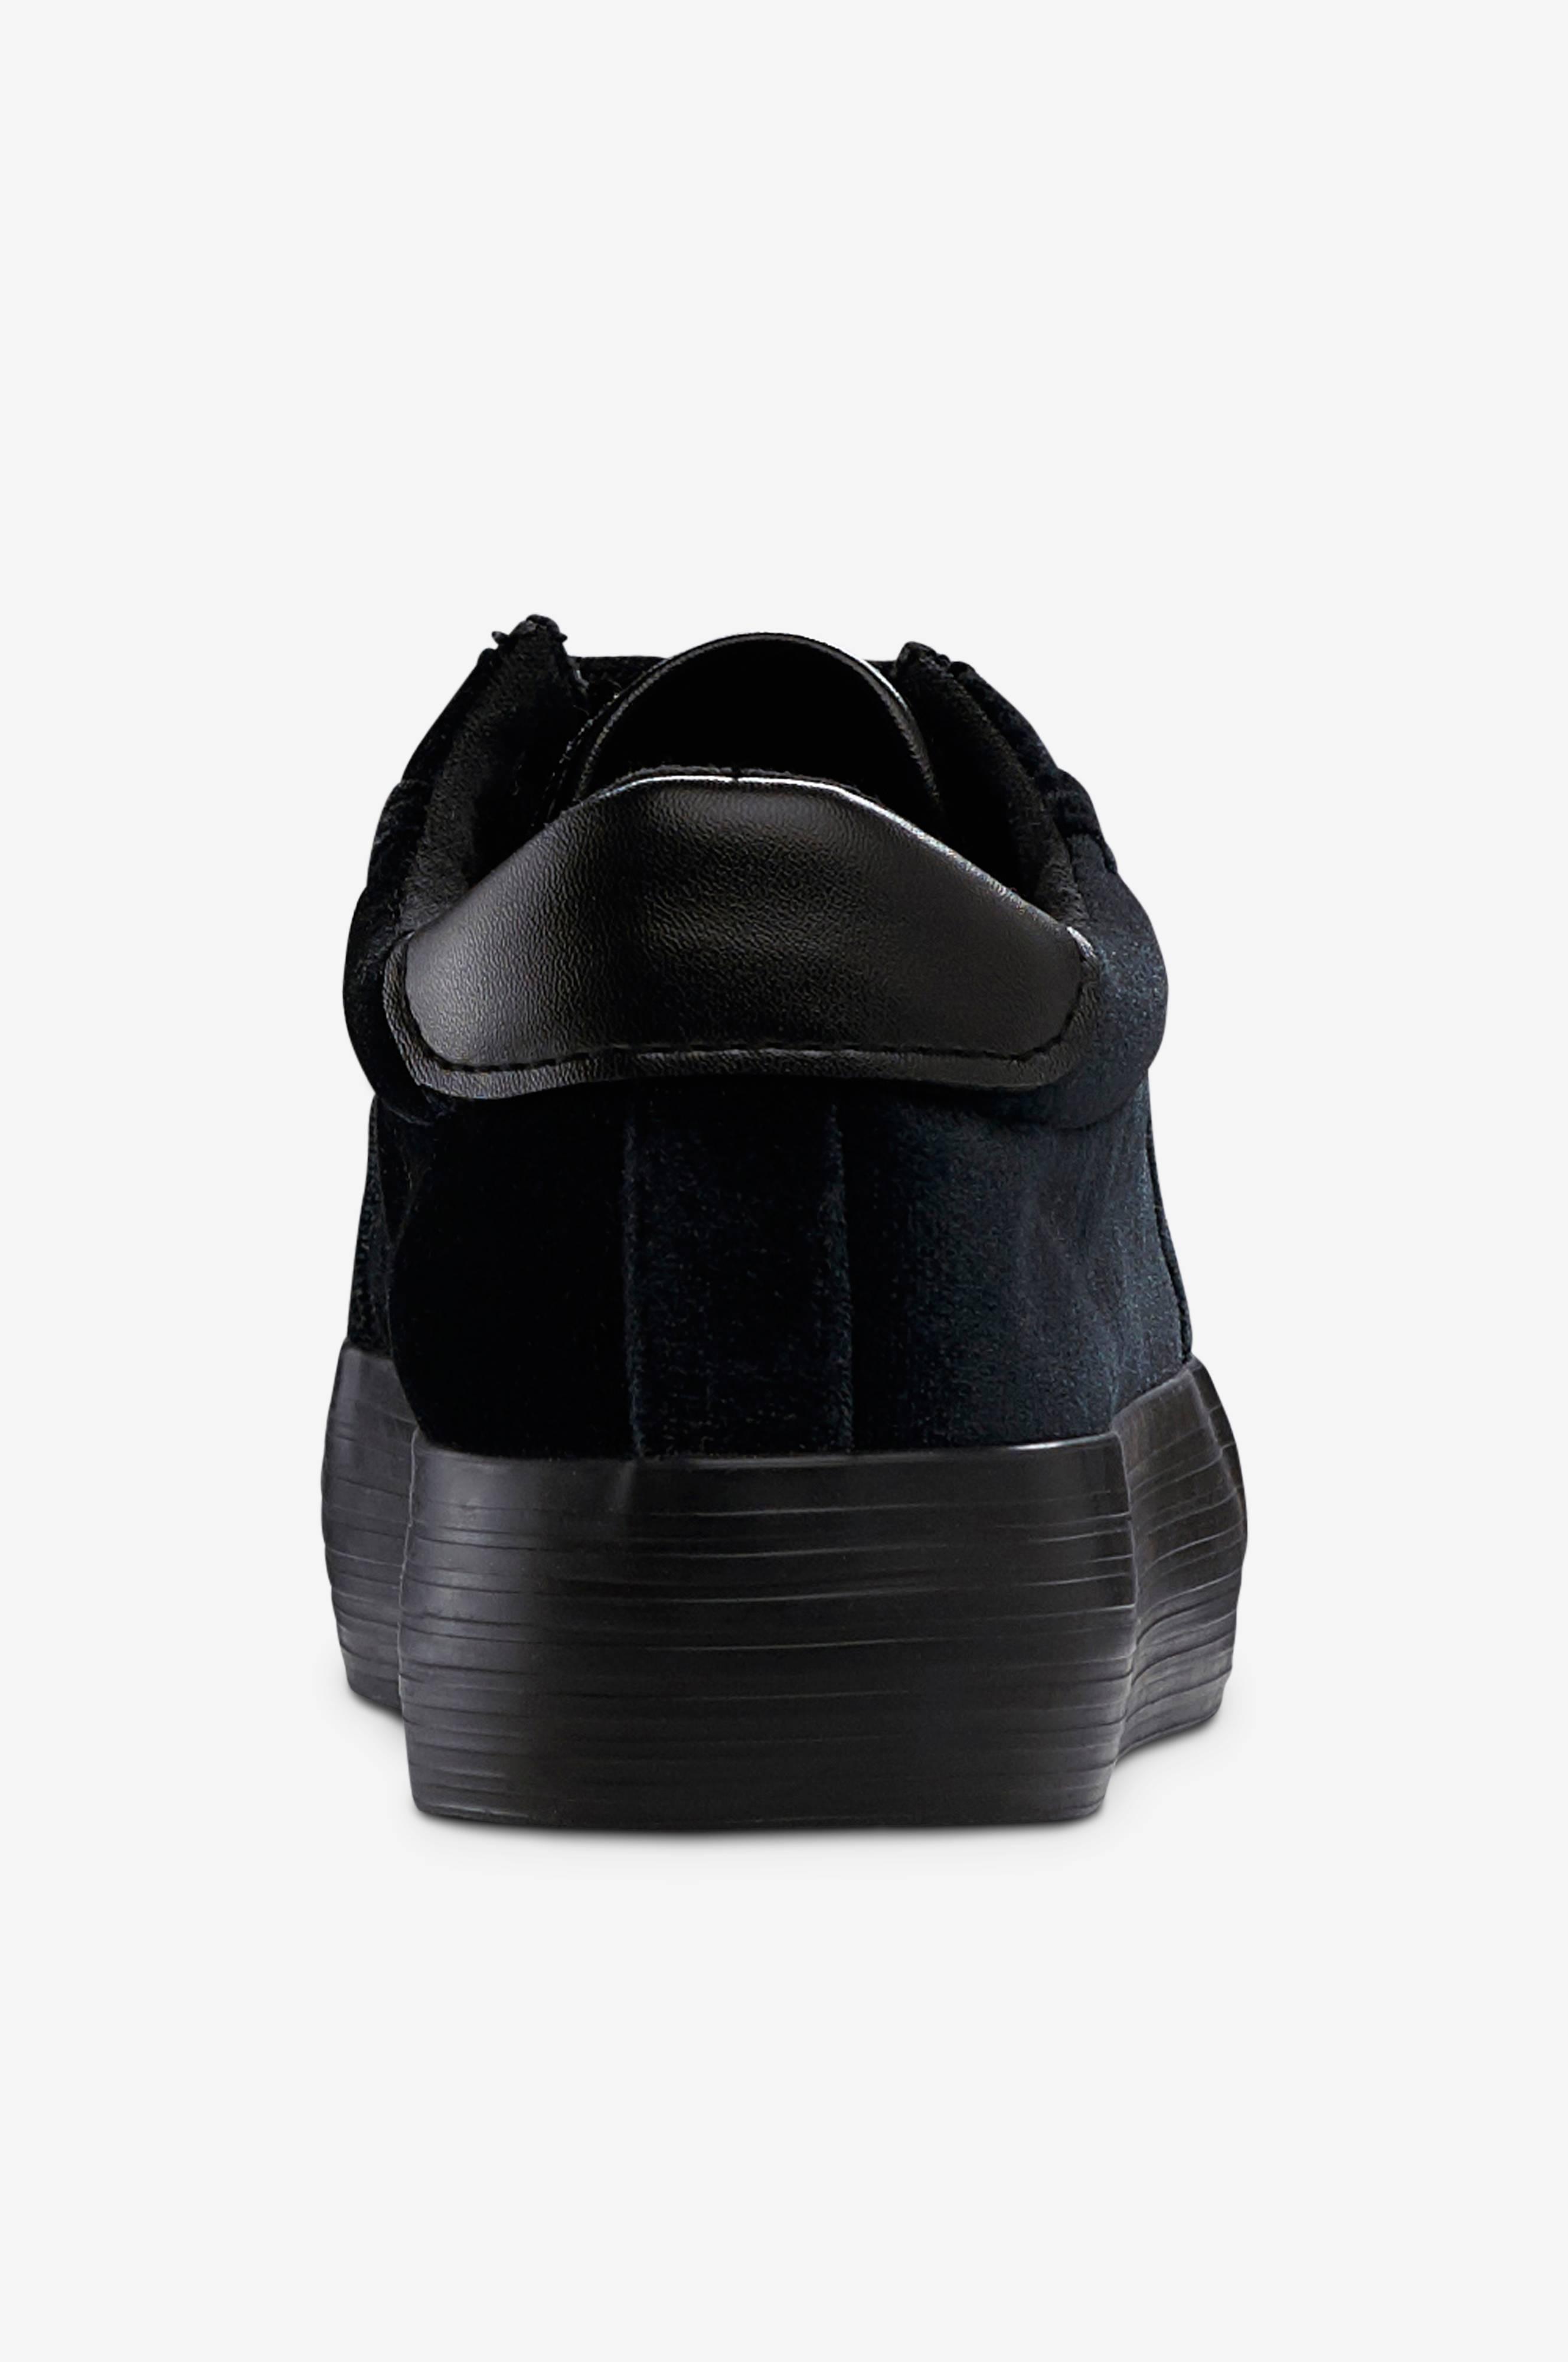 Ellos Shoes Sneakers Barbro Velvet Svart Dam Ellos.se